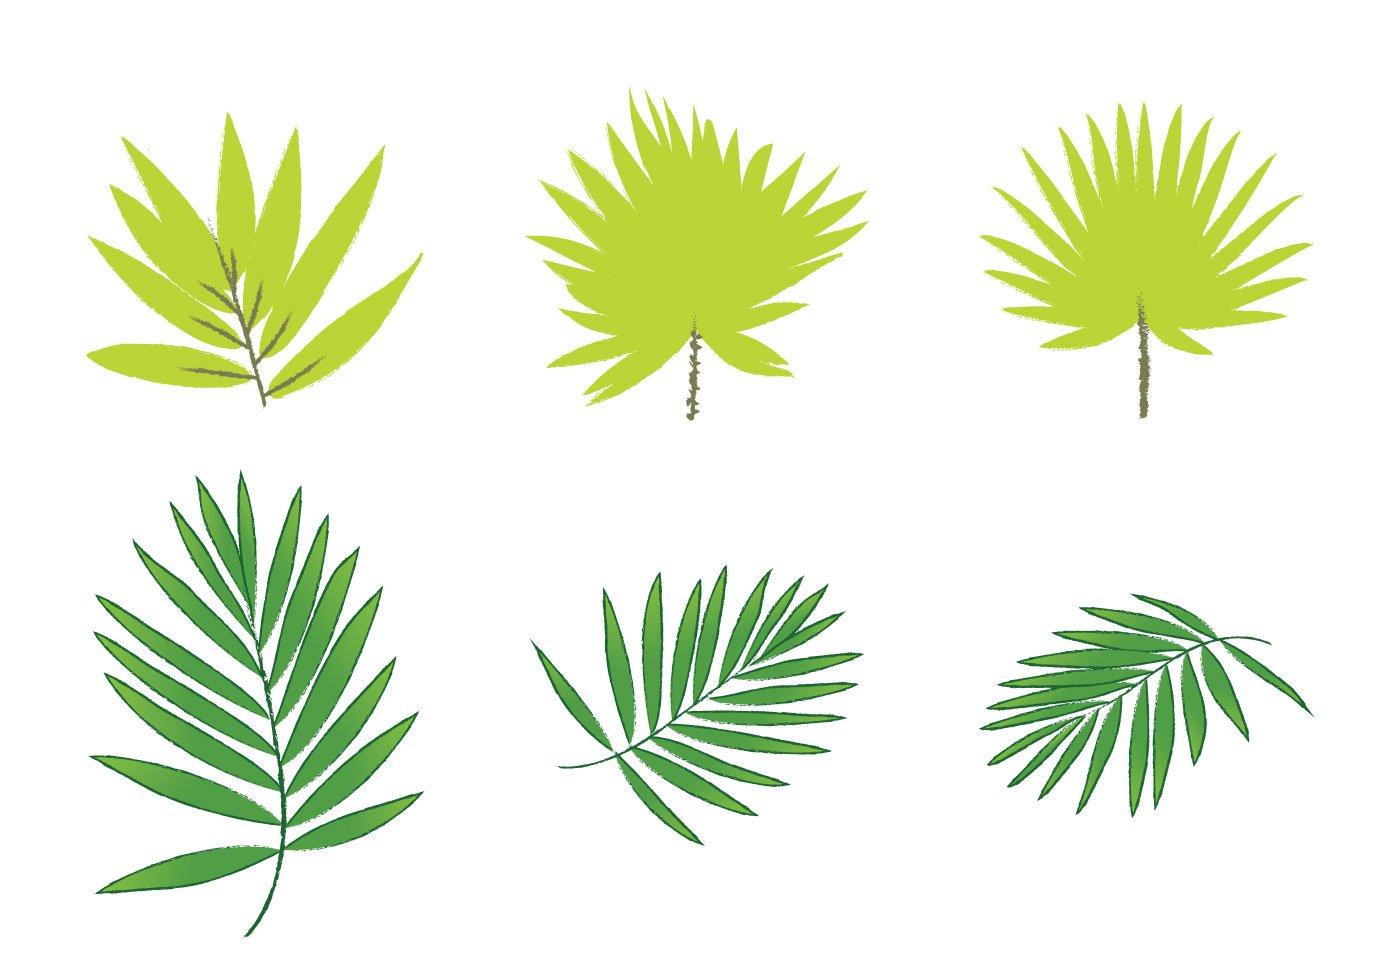 18 Palm Leaf Vector Art Images Palm Tree Vector Free Vector Palm Leaves And Palm Tree Silhouette Clip Art Free Newdesignfile Com 115,000+ vectors, stock photos & psd files. newdesignfile com